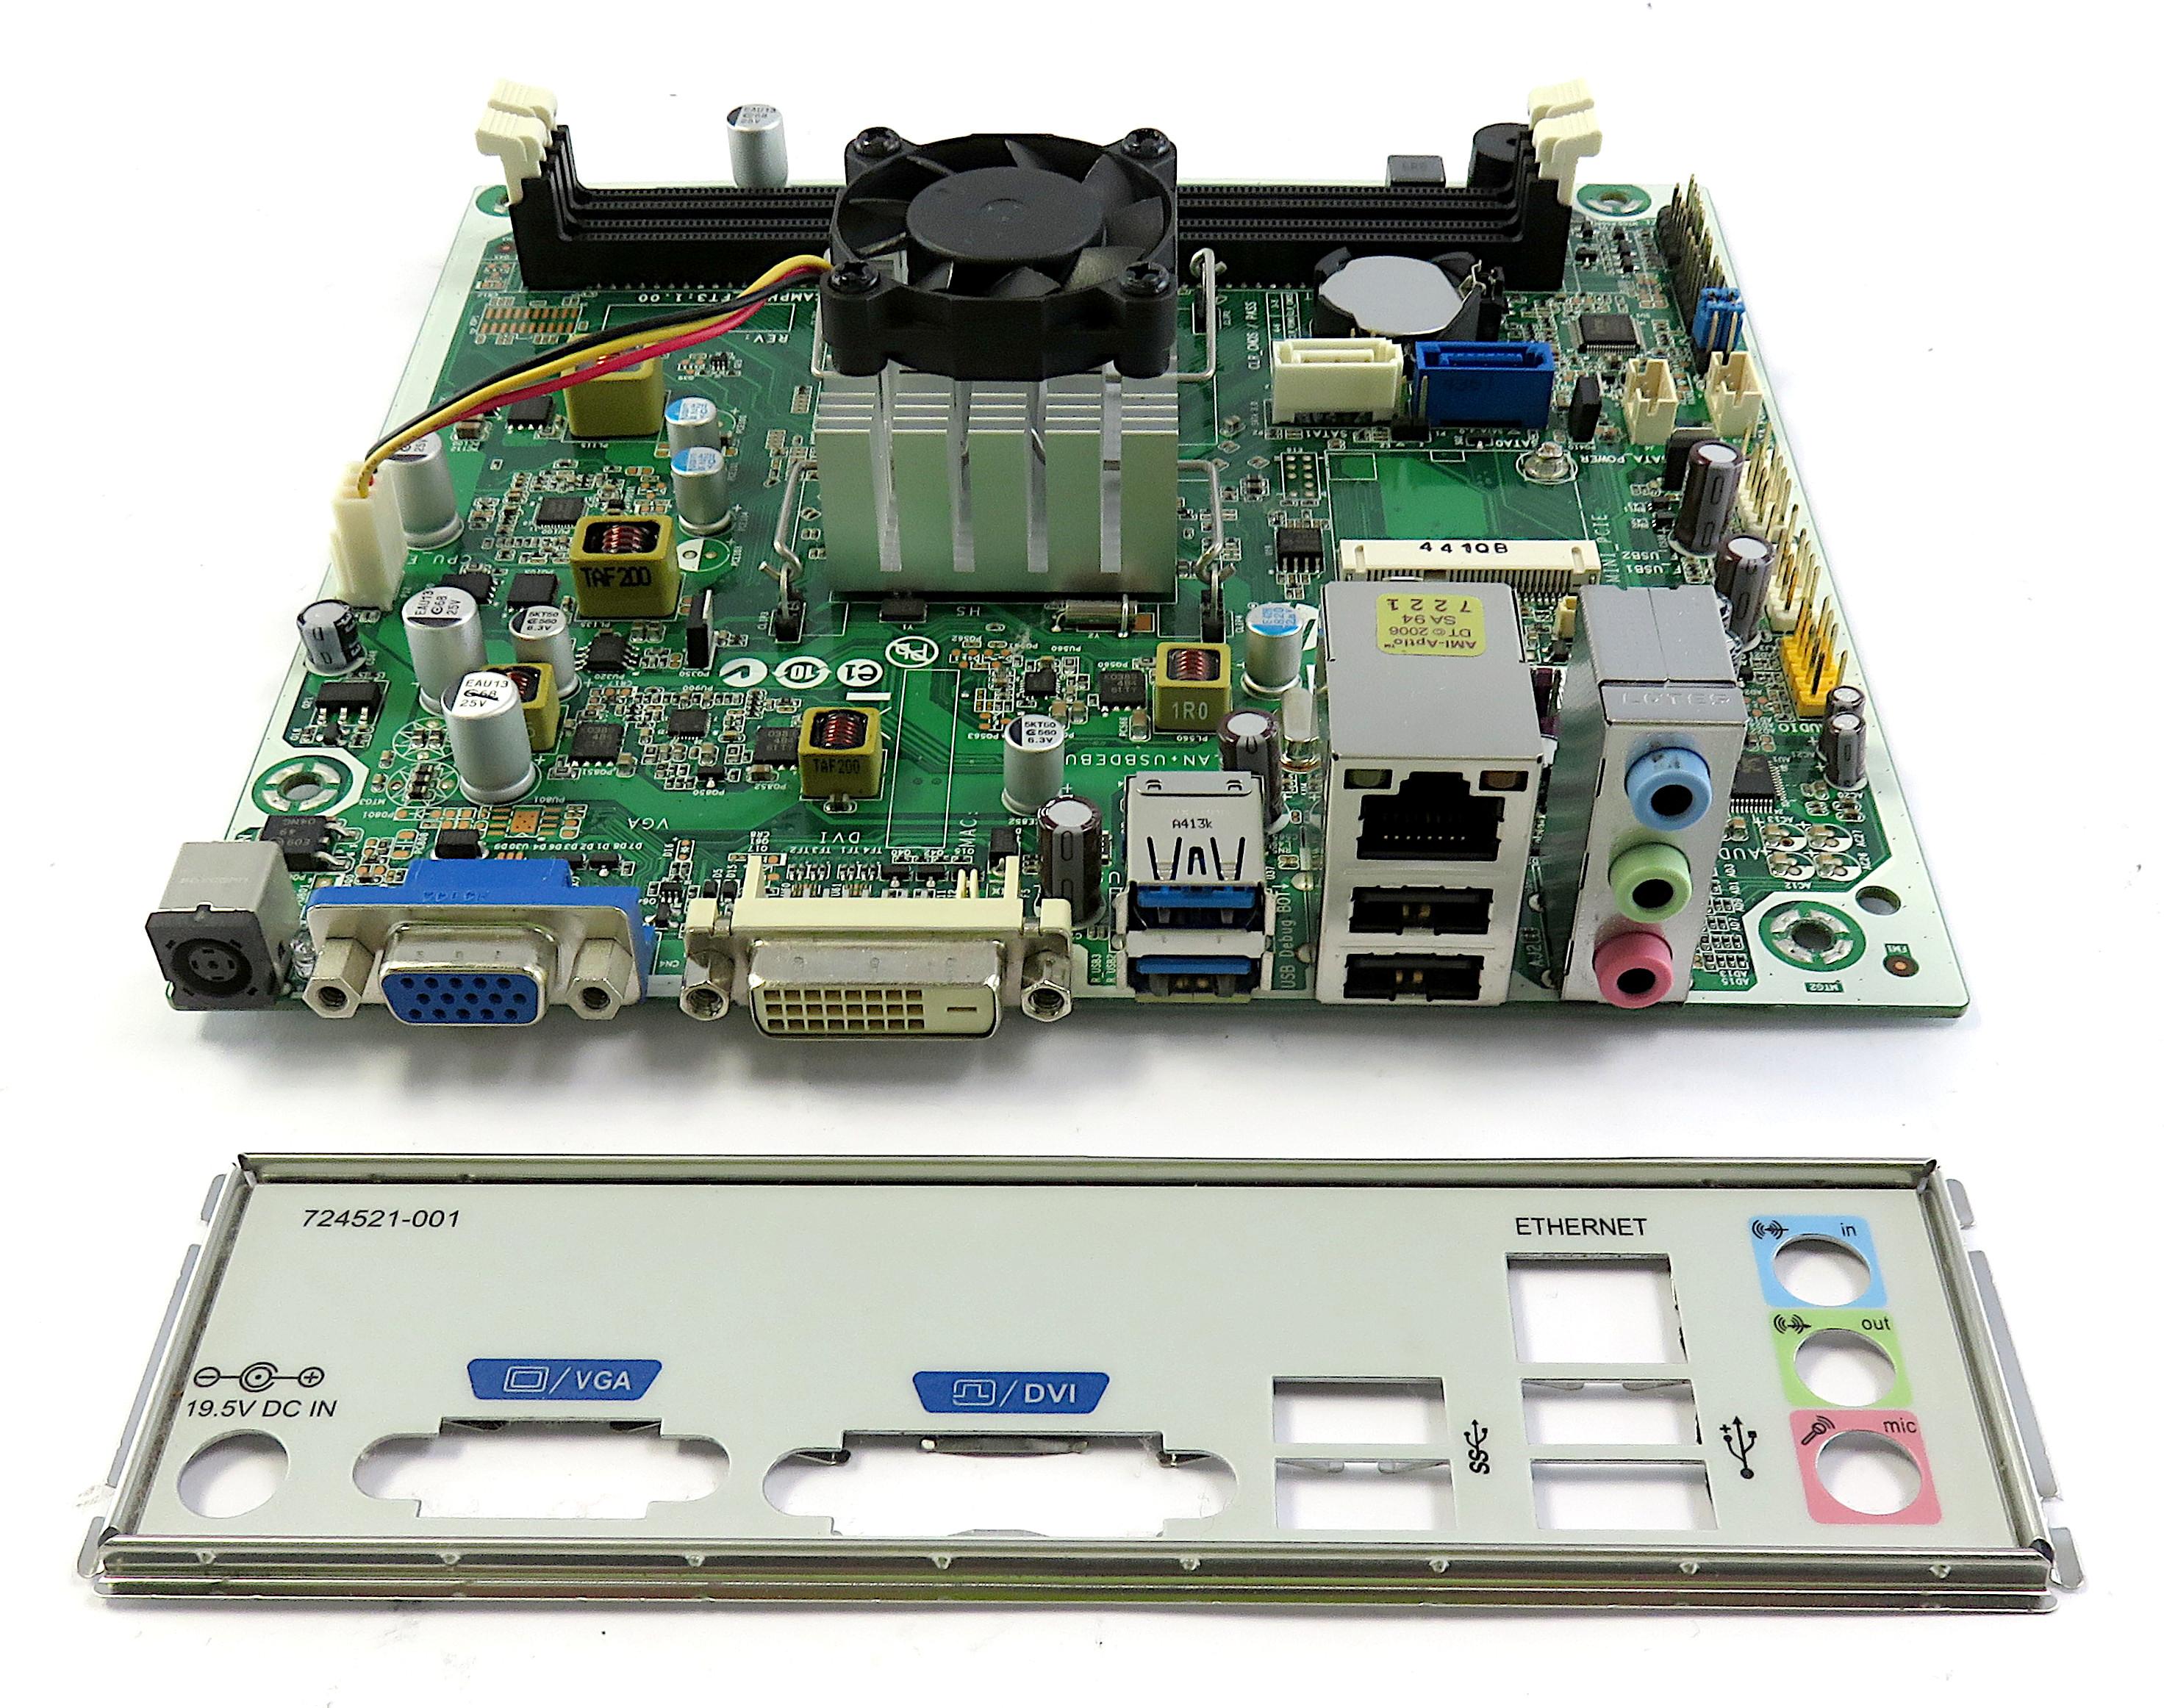 HP 721891-001 110-352na Desktop PC Motherboard with BGA AMD AM5200IAJ44HM CPU